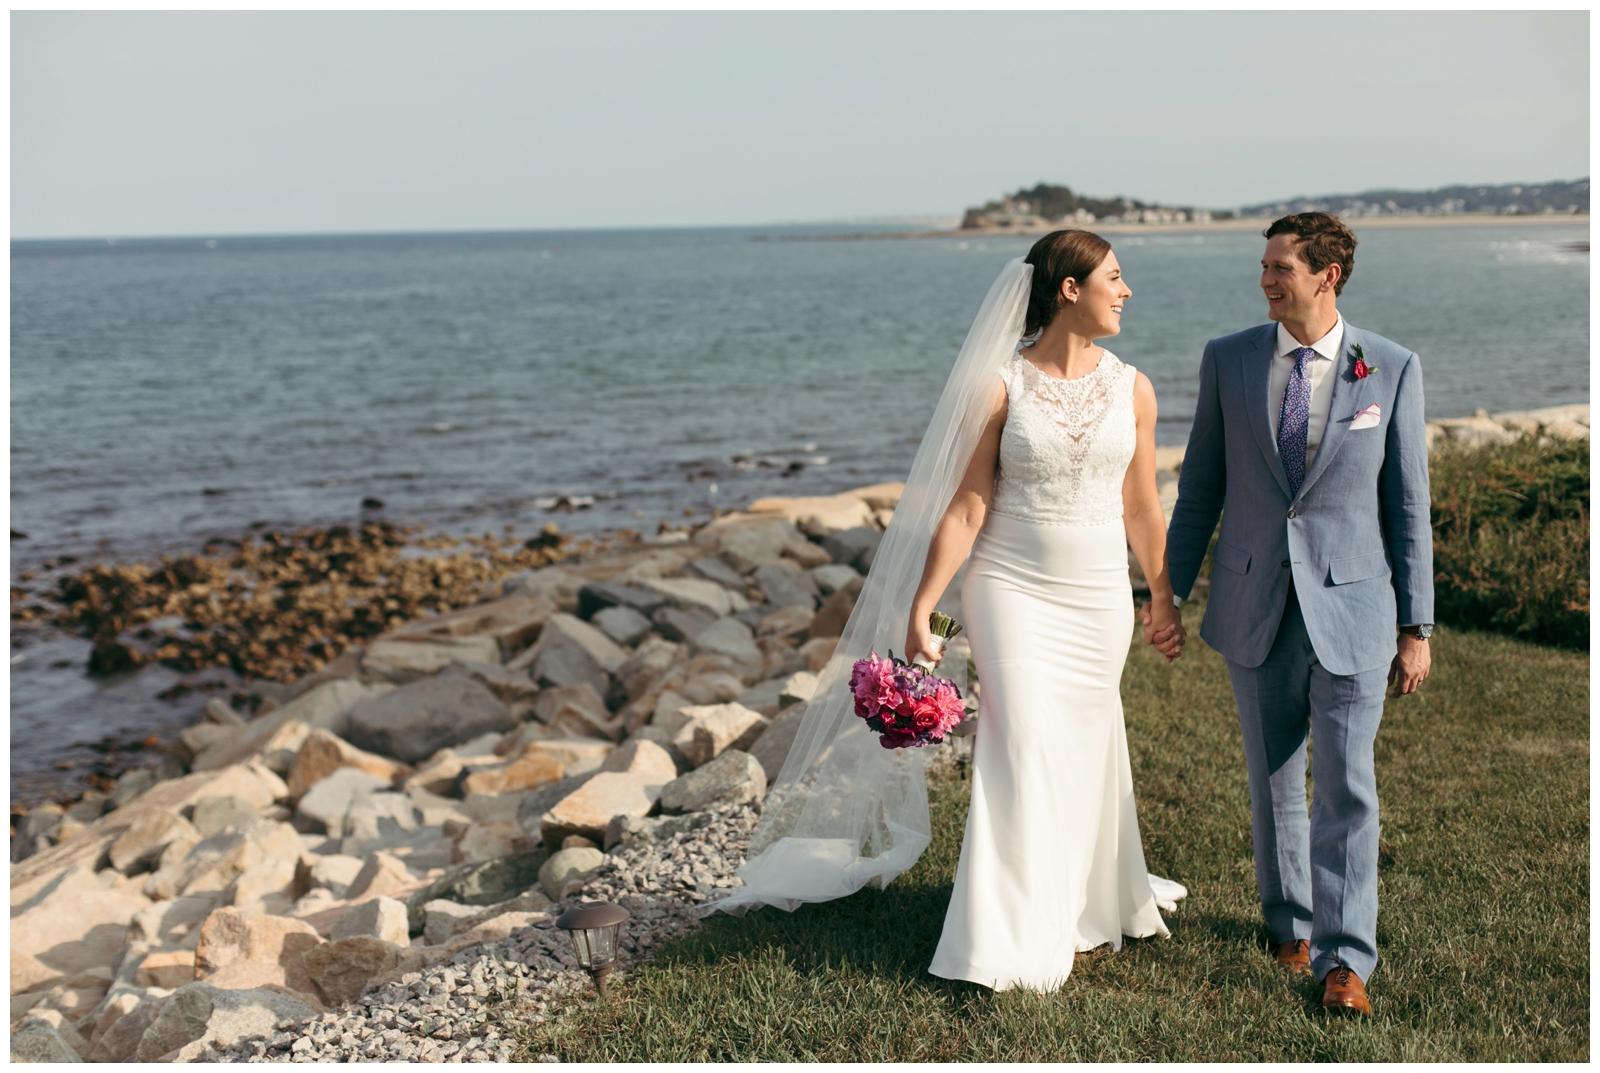 Bailey-Q-Photo-Backyard-Wedding-South-Shore-Boston-Wedding-Photographer-061.jpg